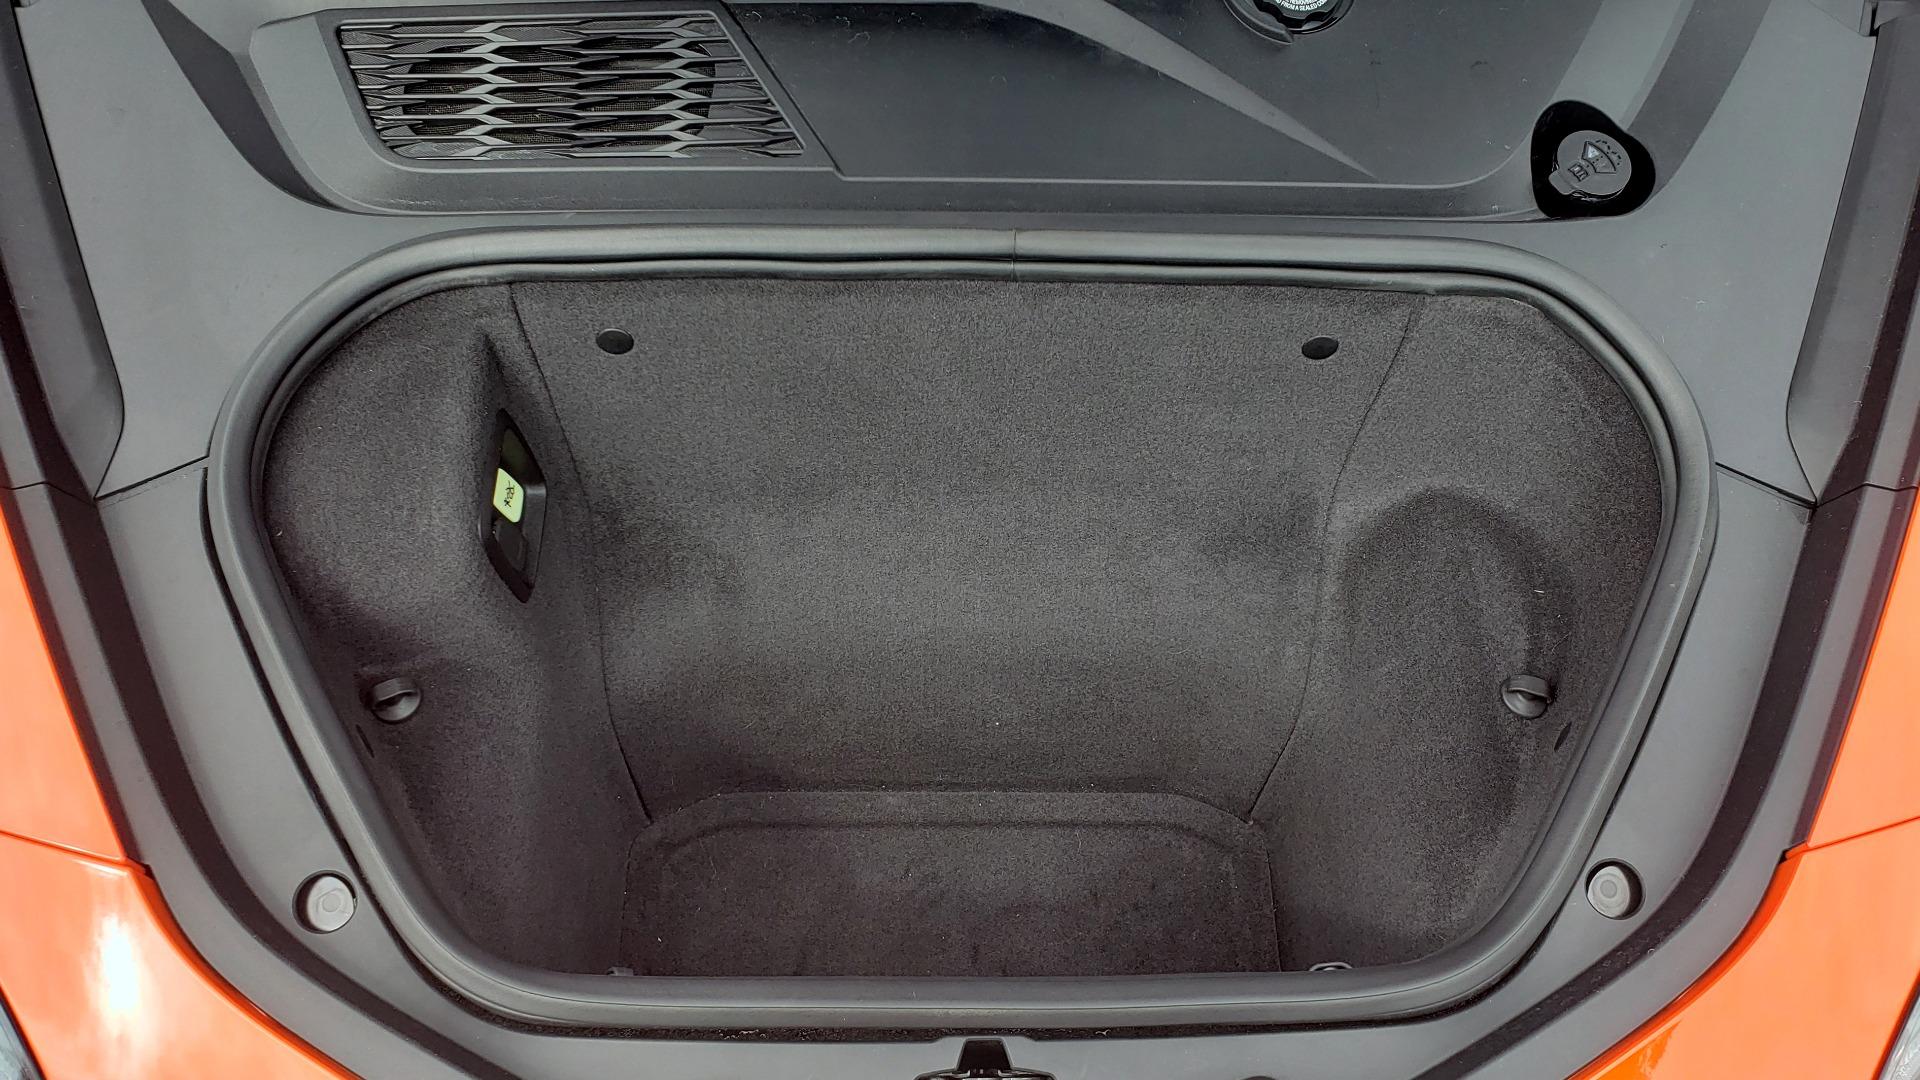 Used 2020 Chevrolet CORVETTE C8 STINGRAY 2LT / 6.2L V8 / 8-SPD AUTO / NAV / BOSE / REARVIEW / DATA RECOR for sale Sold at Formula Imports in Charlotte NC 28227 17